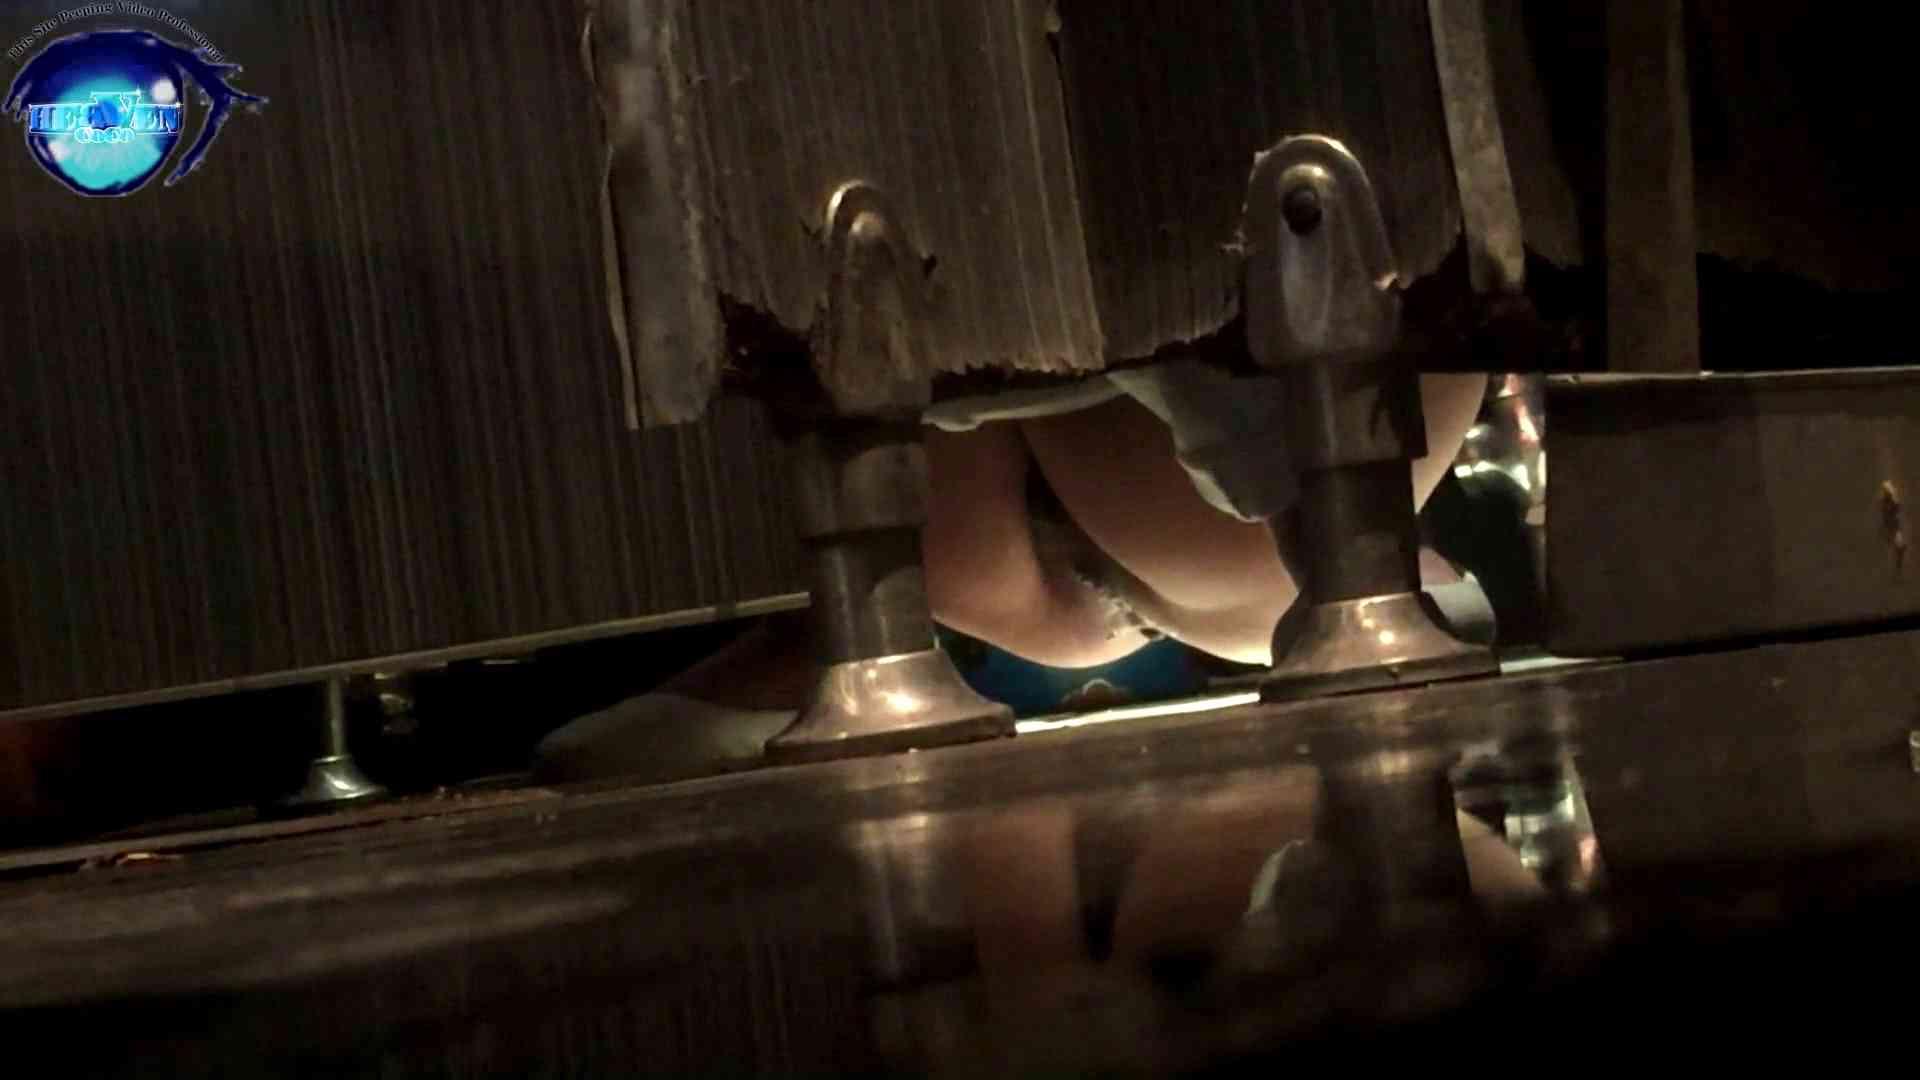 GOD HAND ファッションショッピングセンター盗撮vol.03後編 高画質 おまんこ無修正動画無料 96pic 11